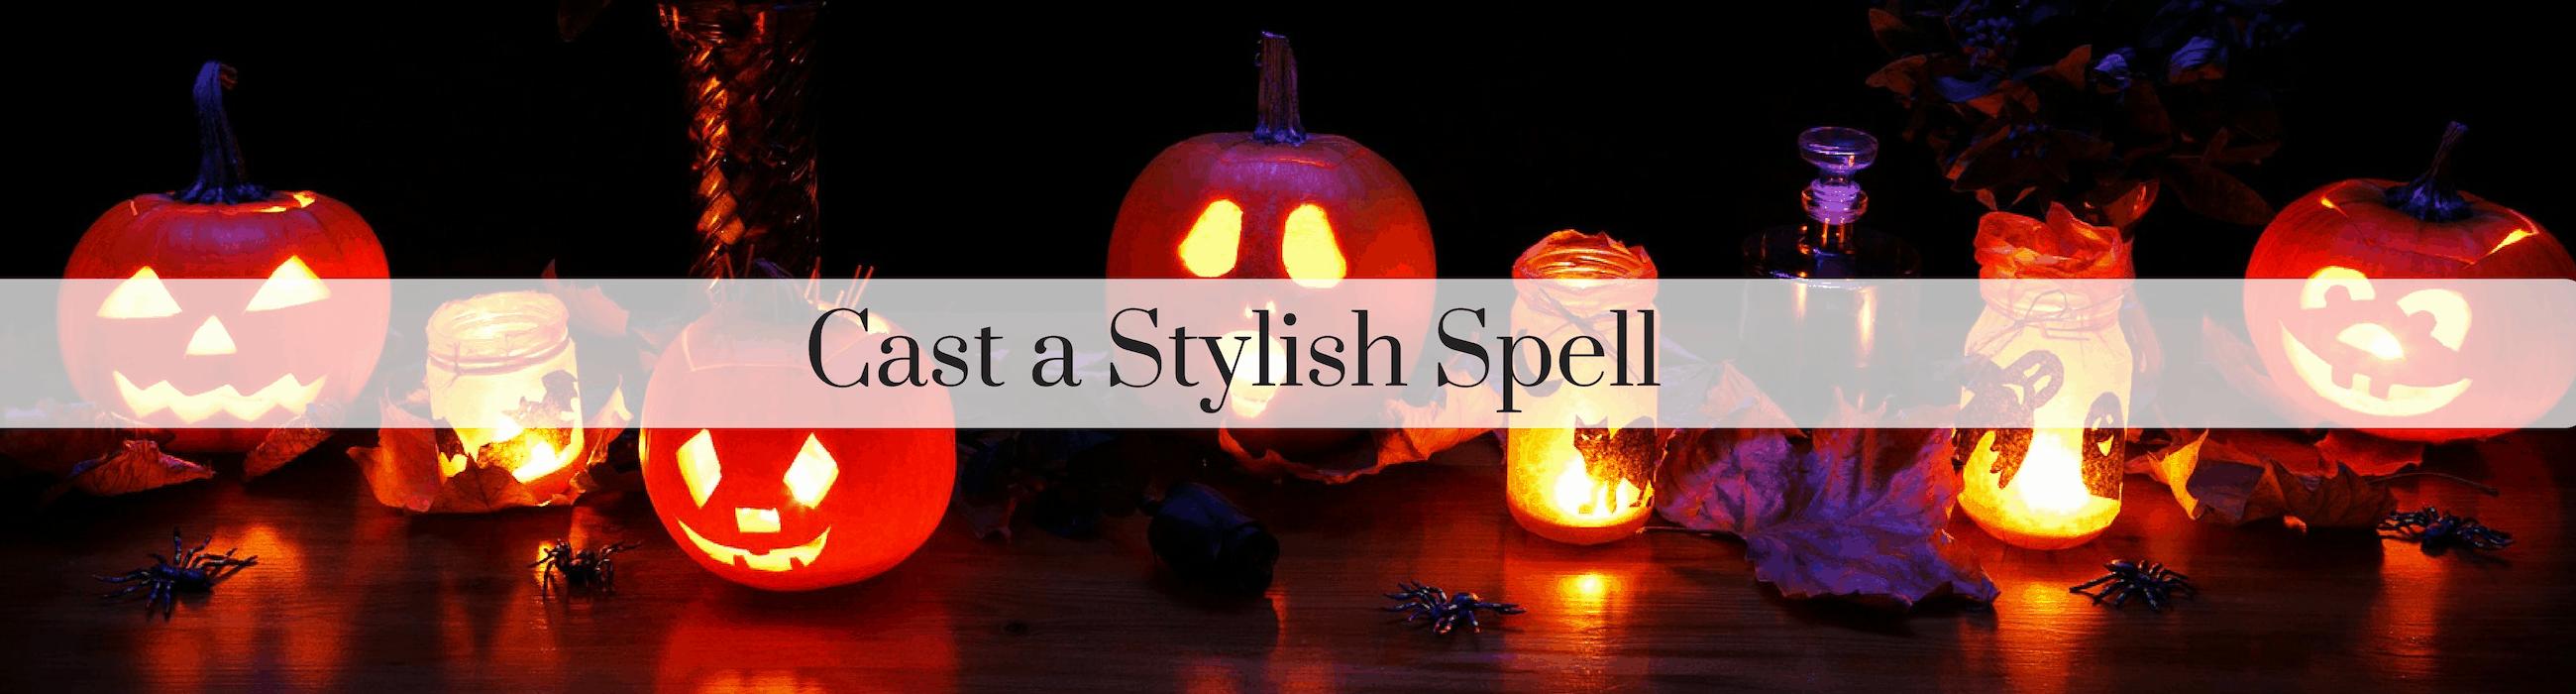 Cast a Stylish Spell Spooky Halloween Celebration